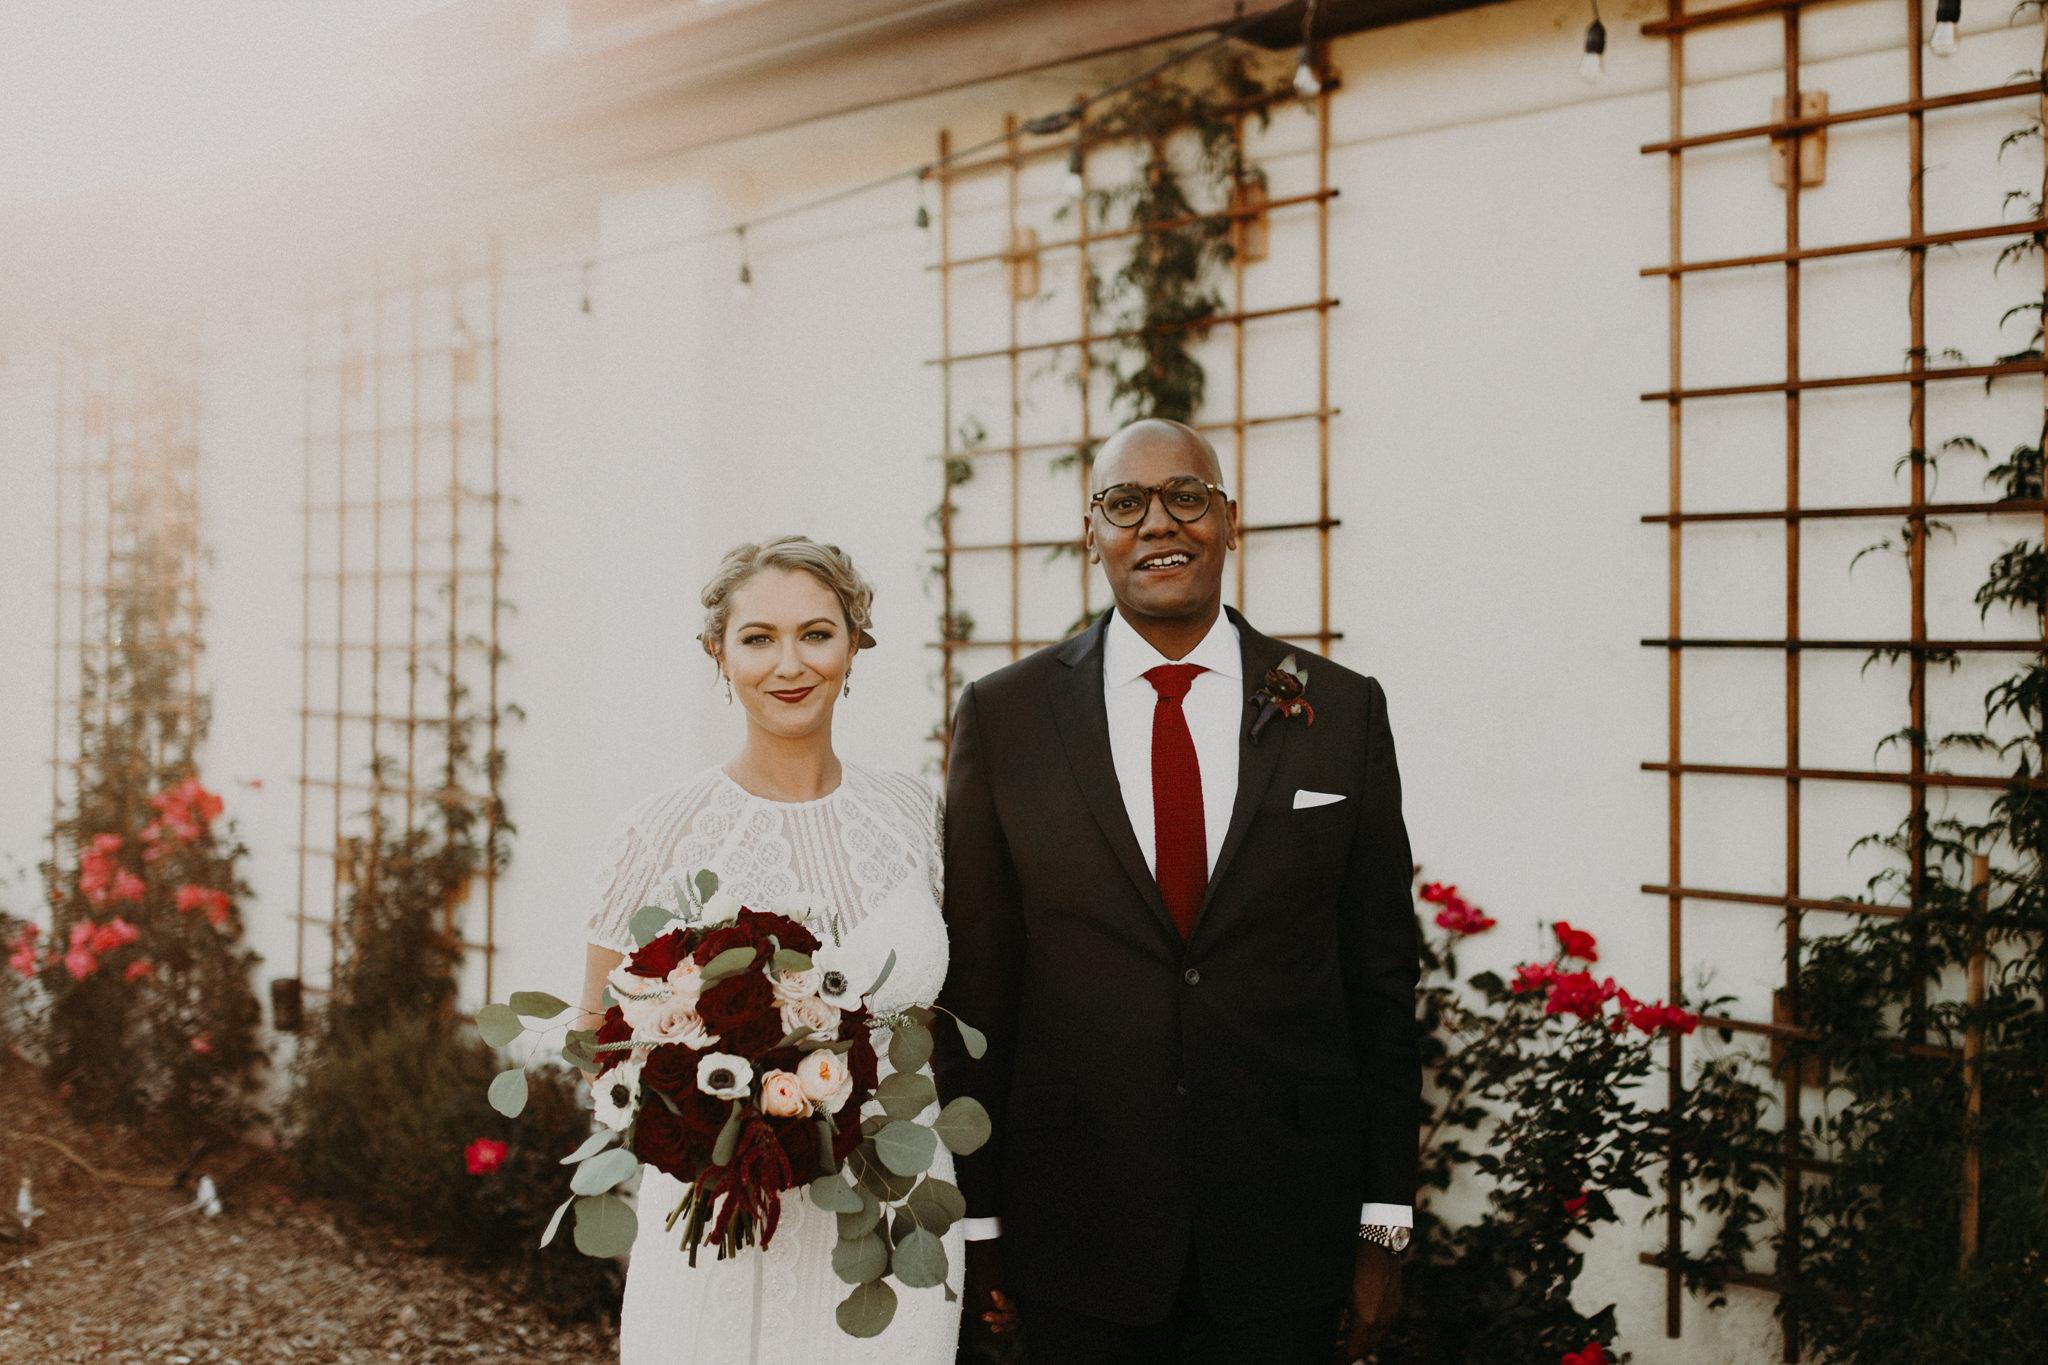 couple-wedding-carmel-wedding-32.jpg